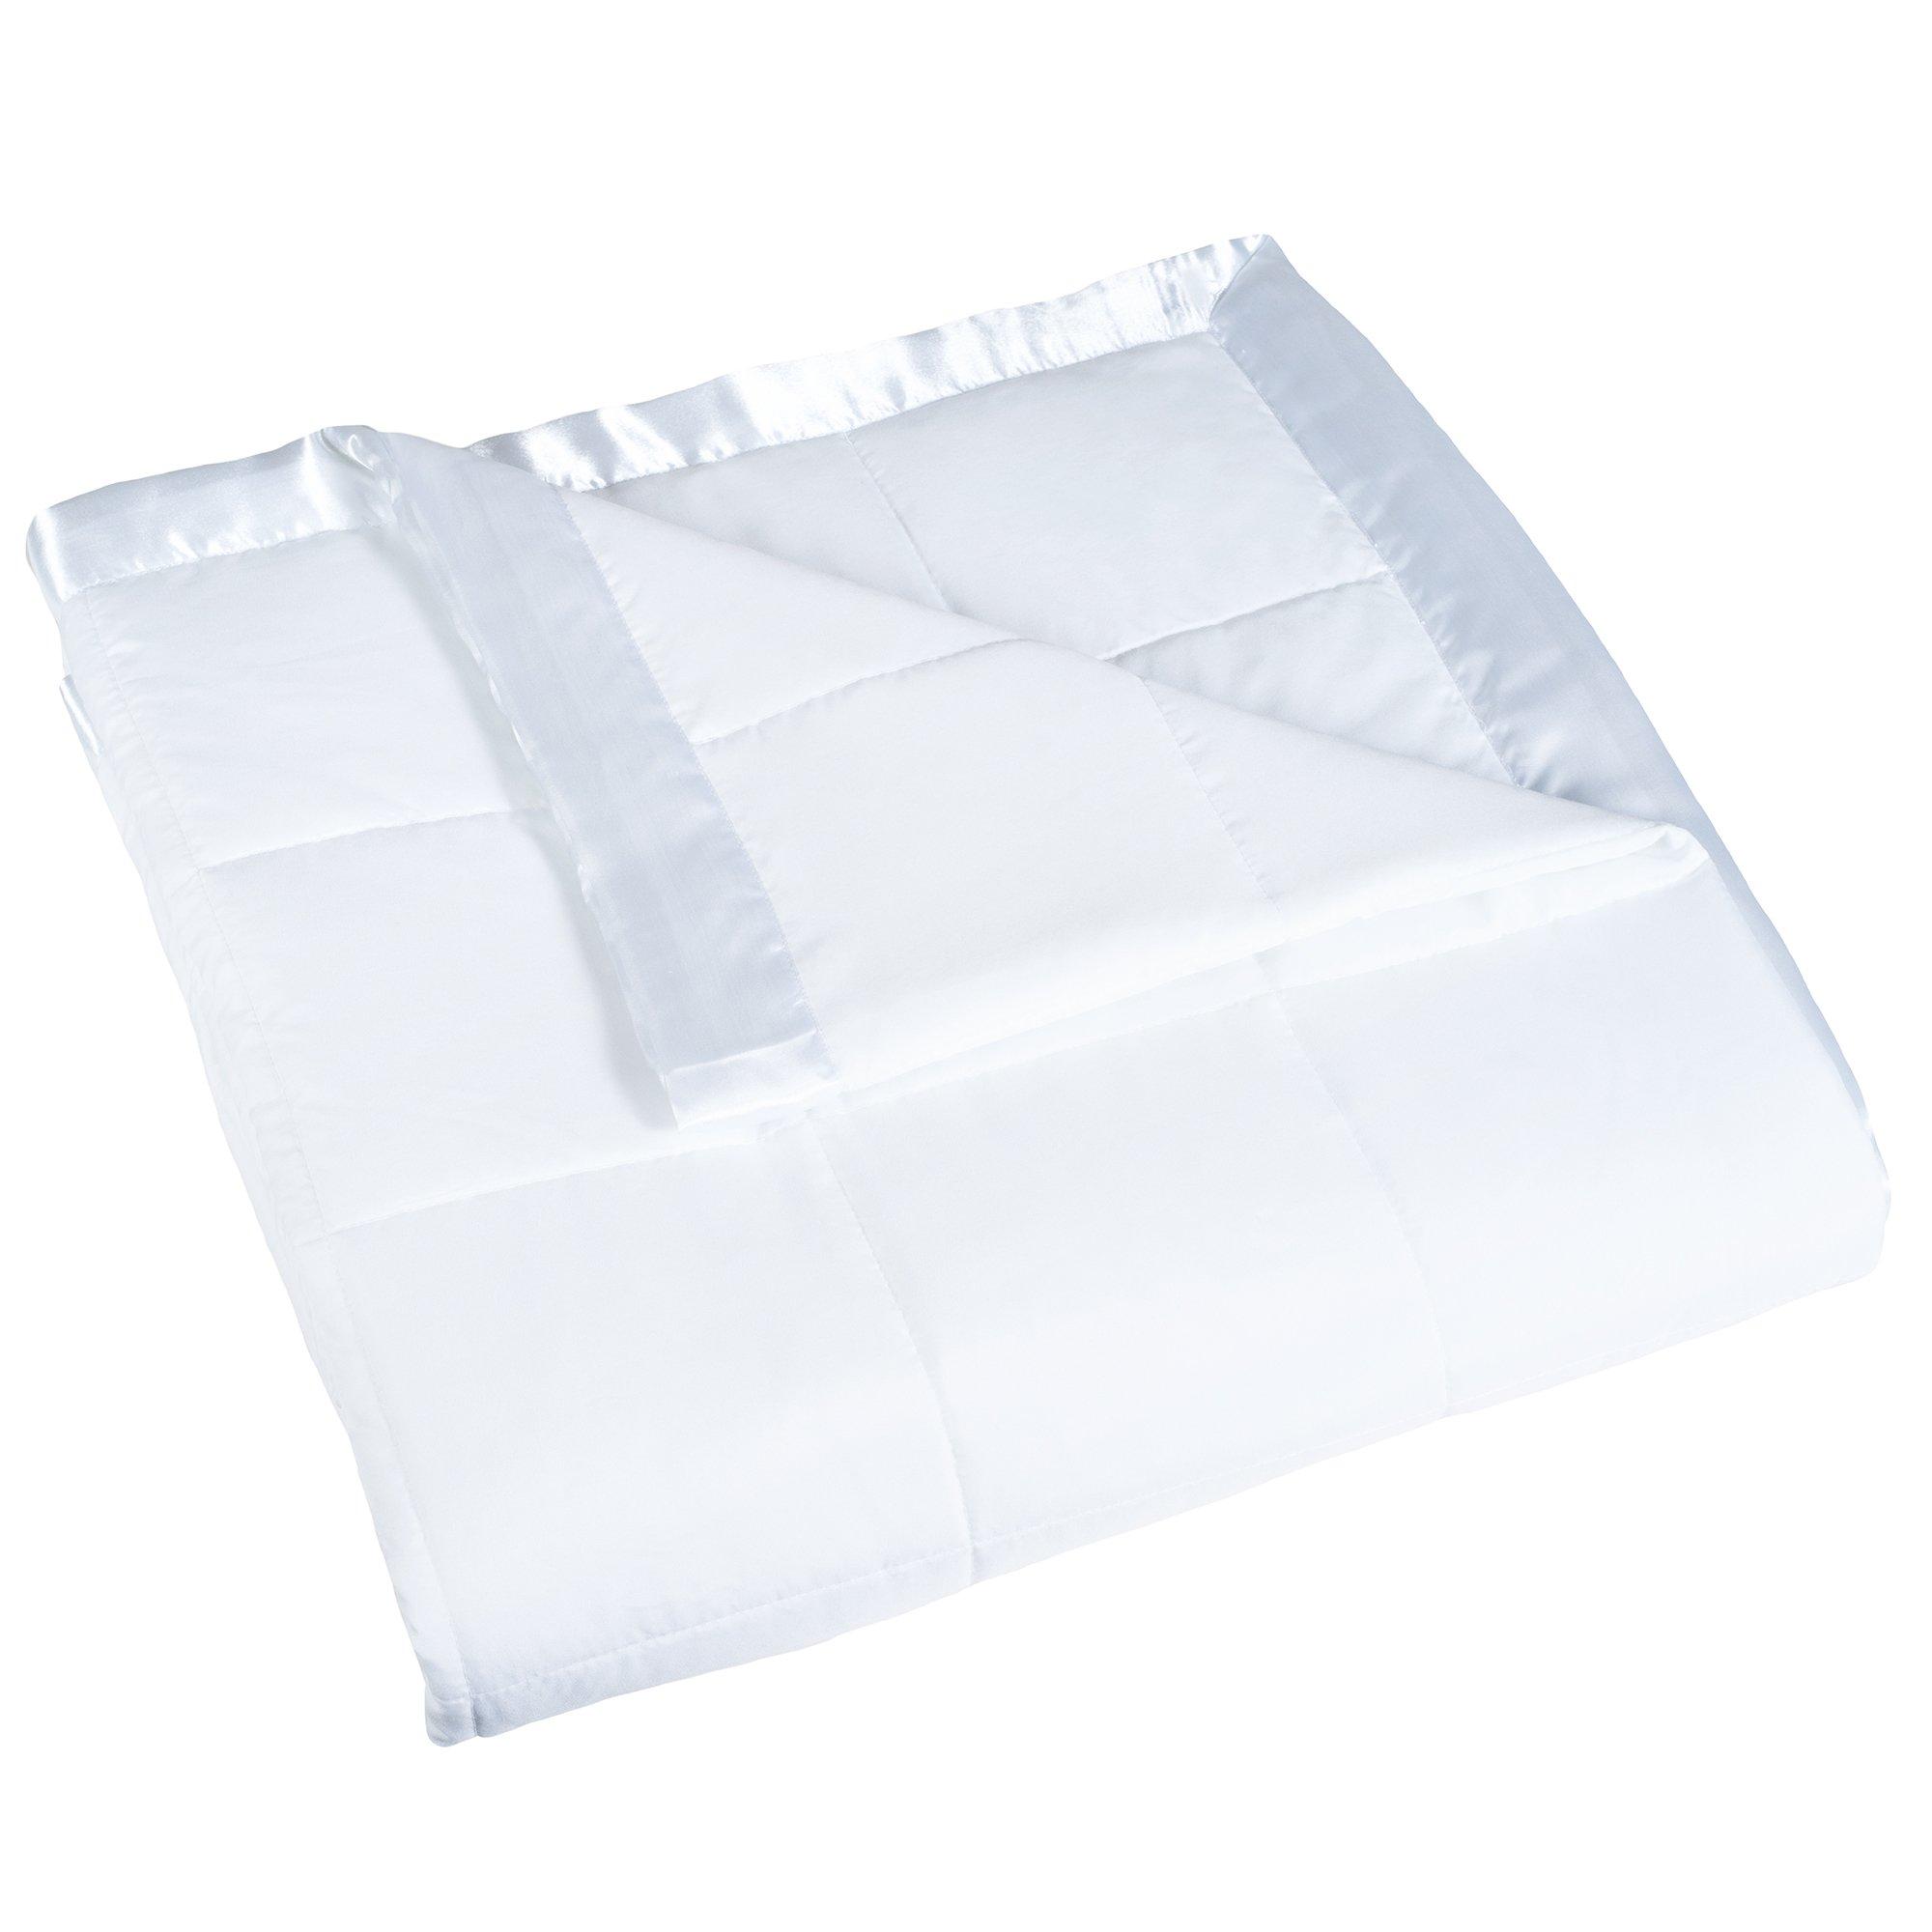 Lavish Home Down Alternative Blanket, Twin, White